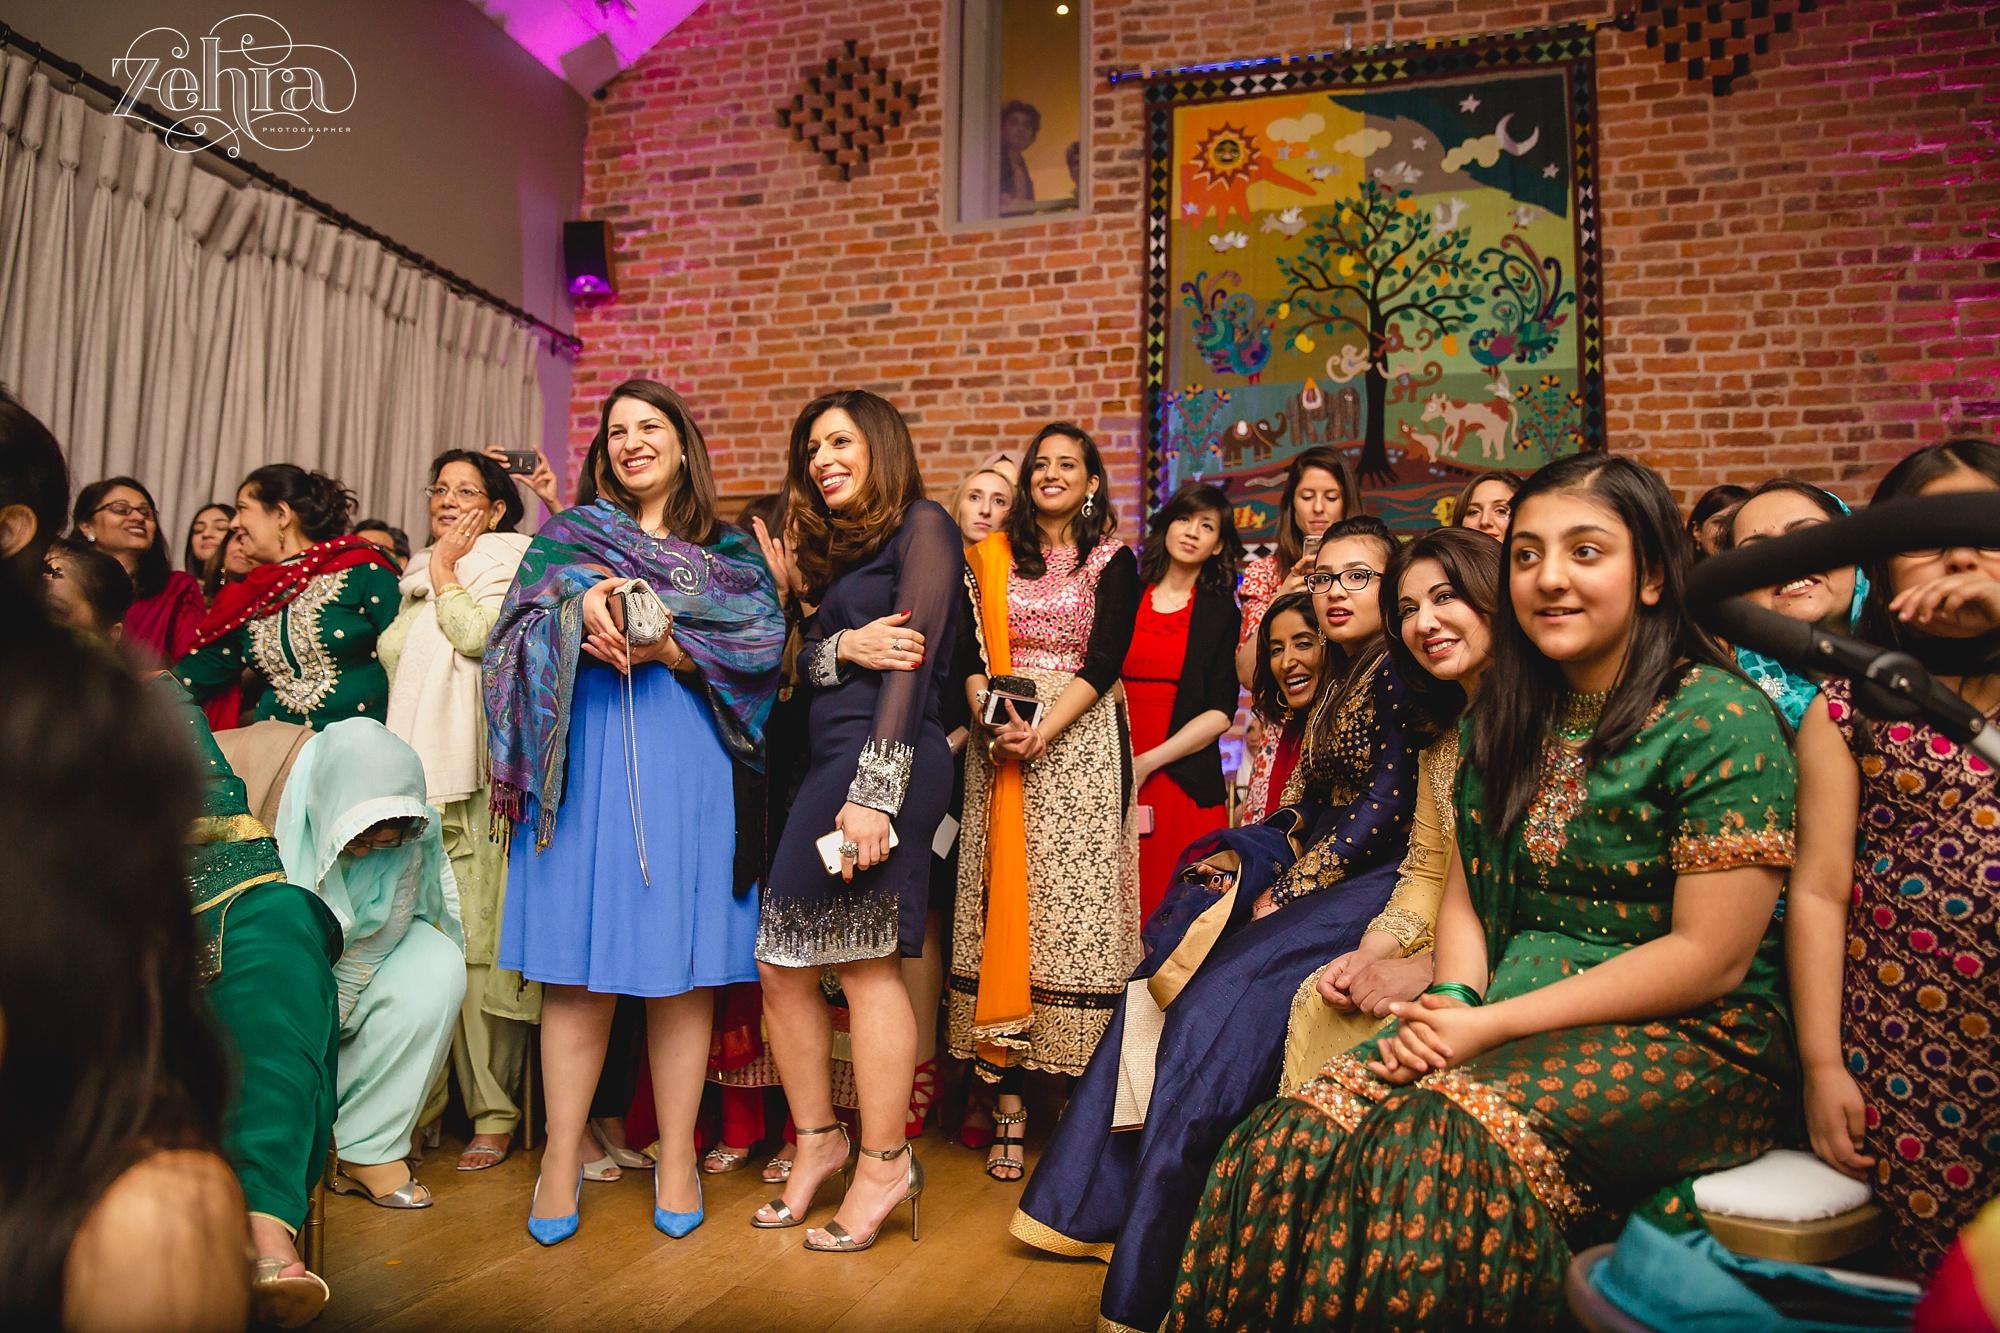 zehra wedding photographer arley hall cheshire041.jpg